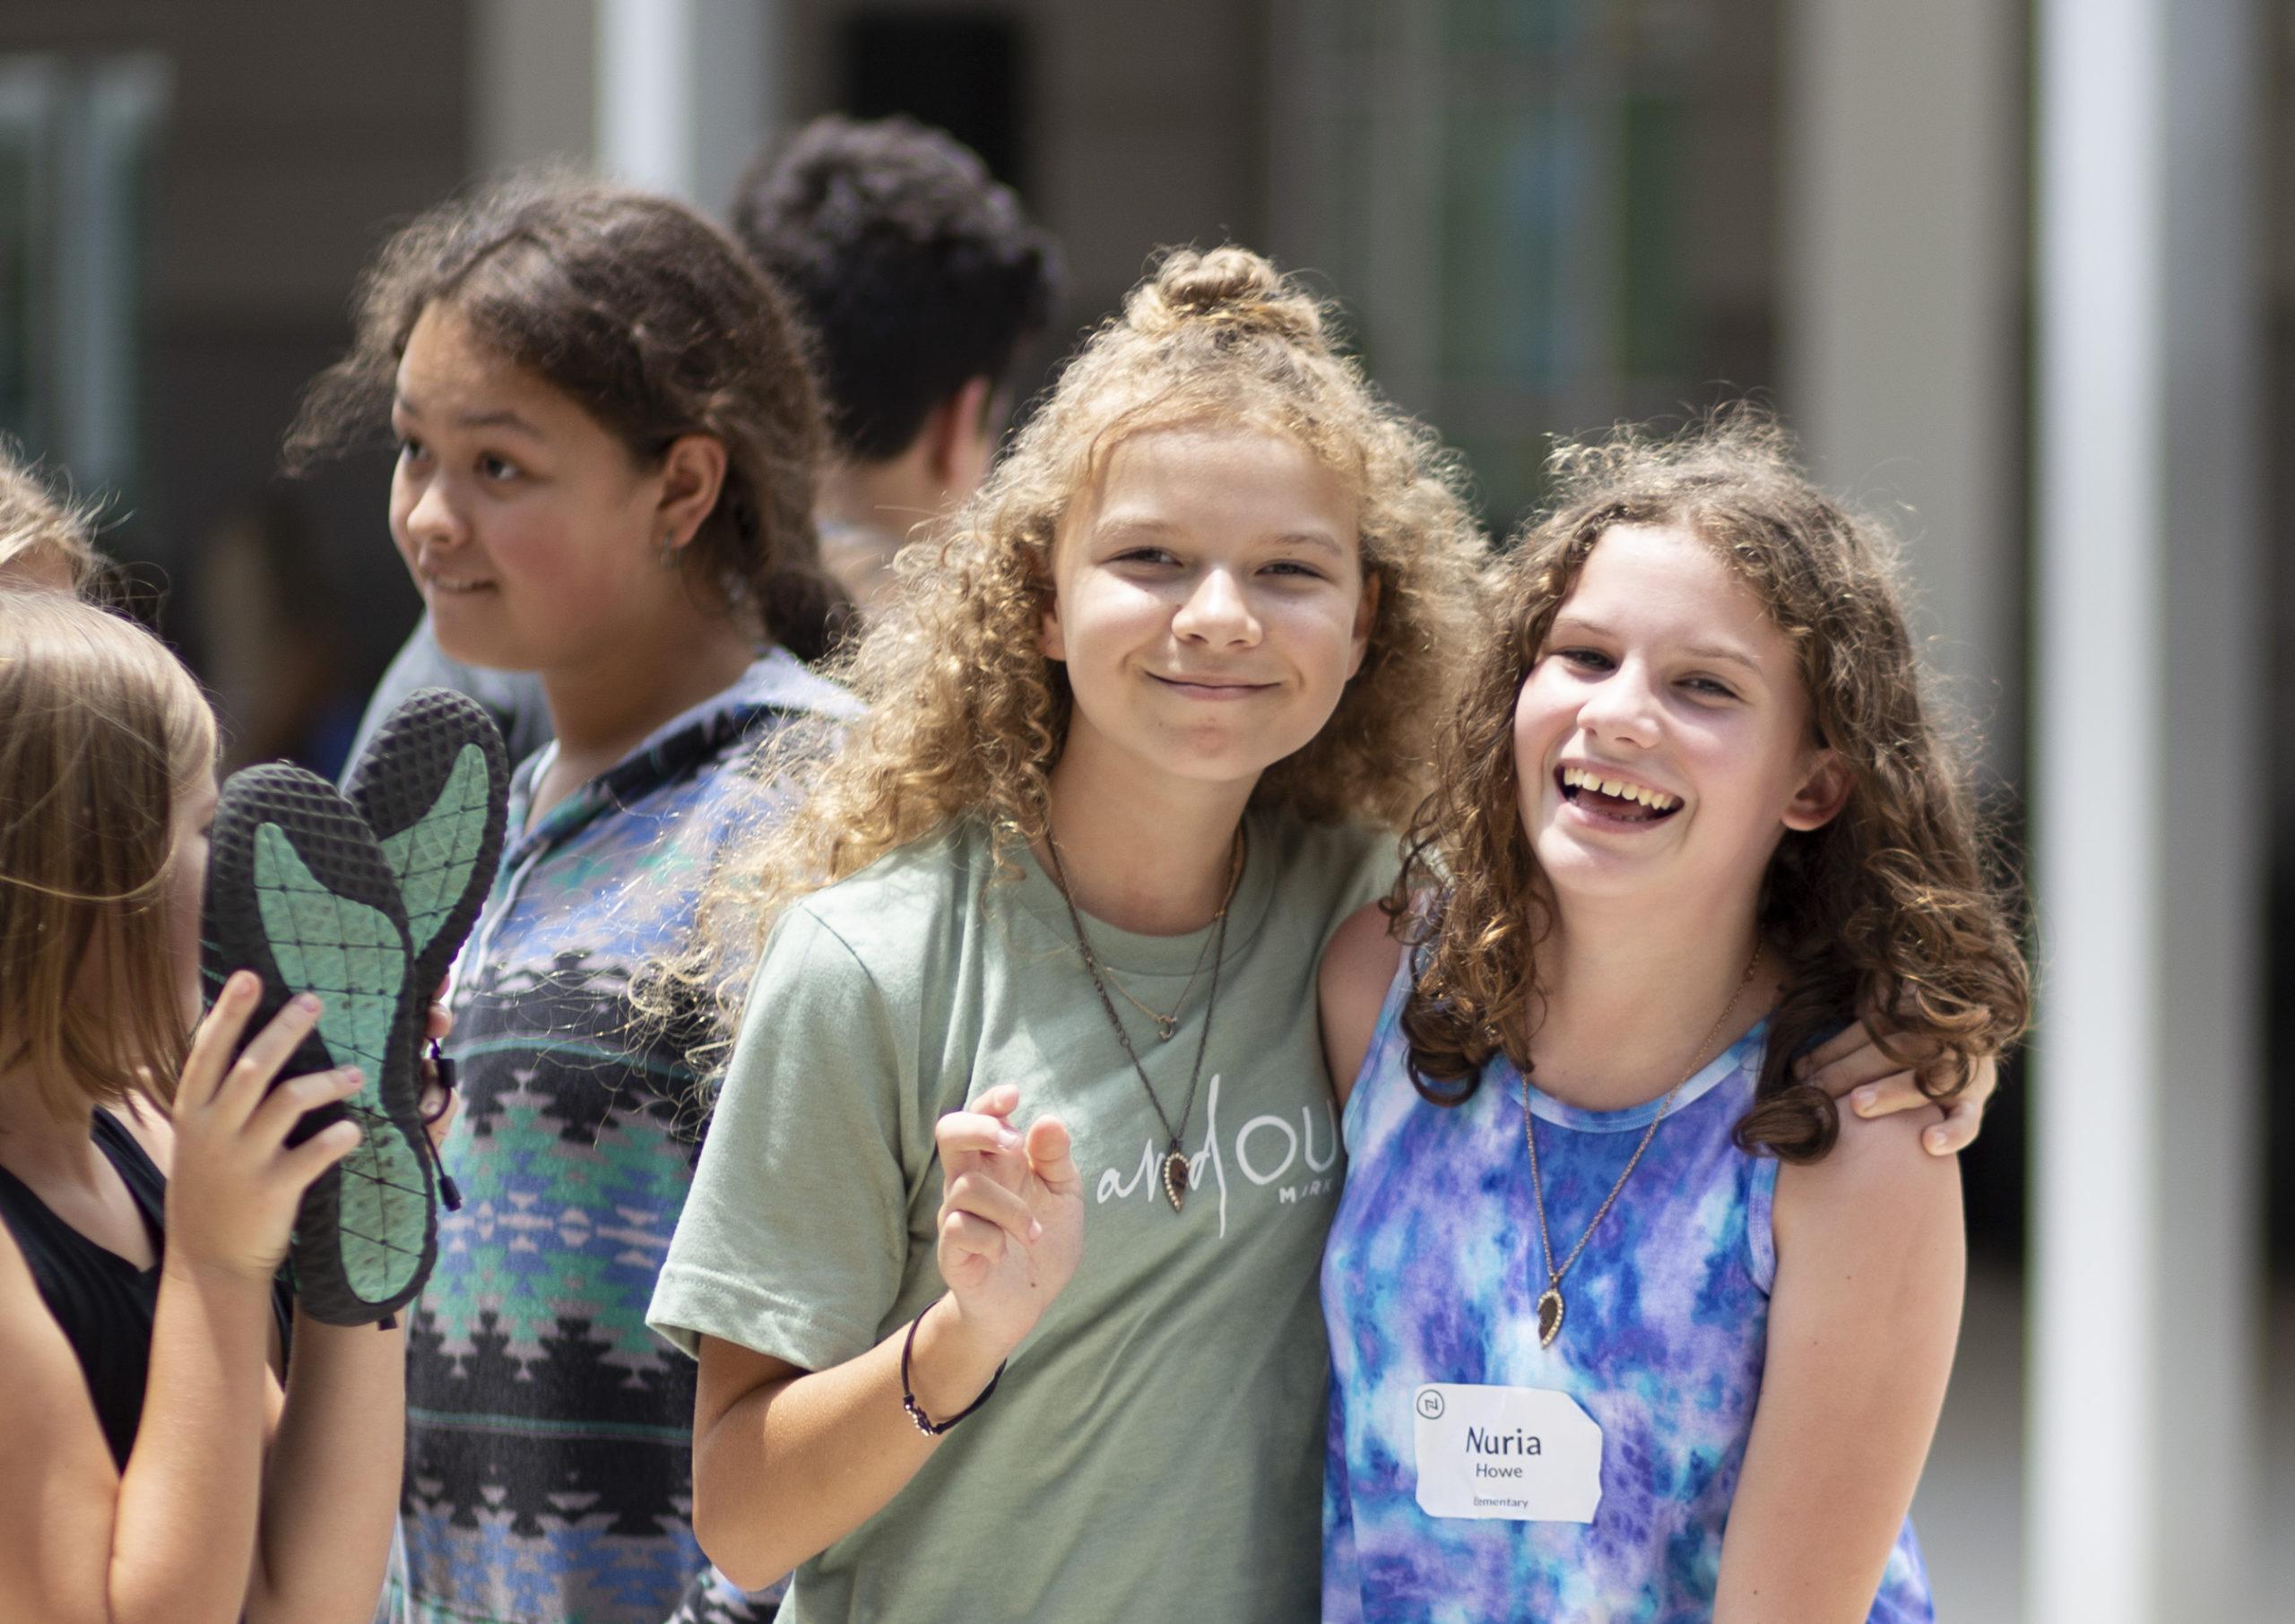 Nations Kids at a Nations Church Orlando Service